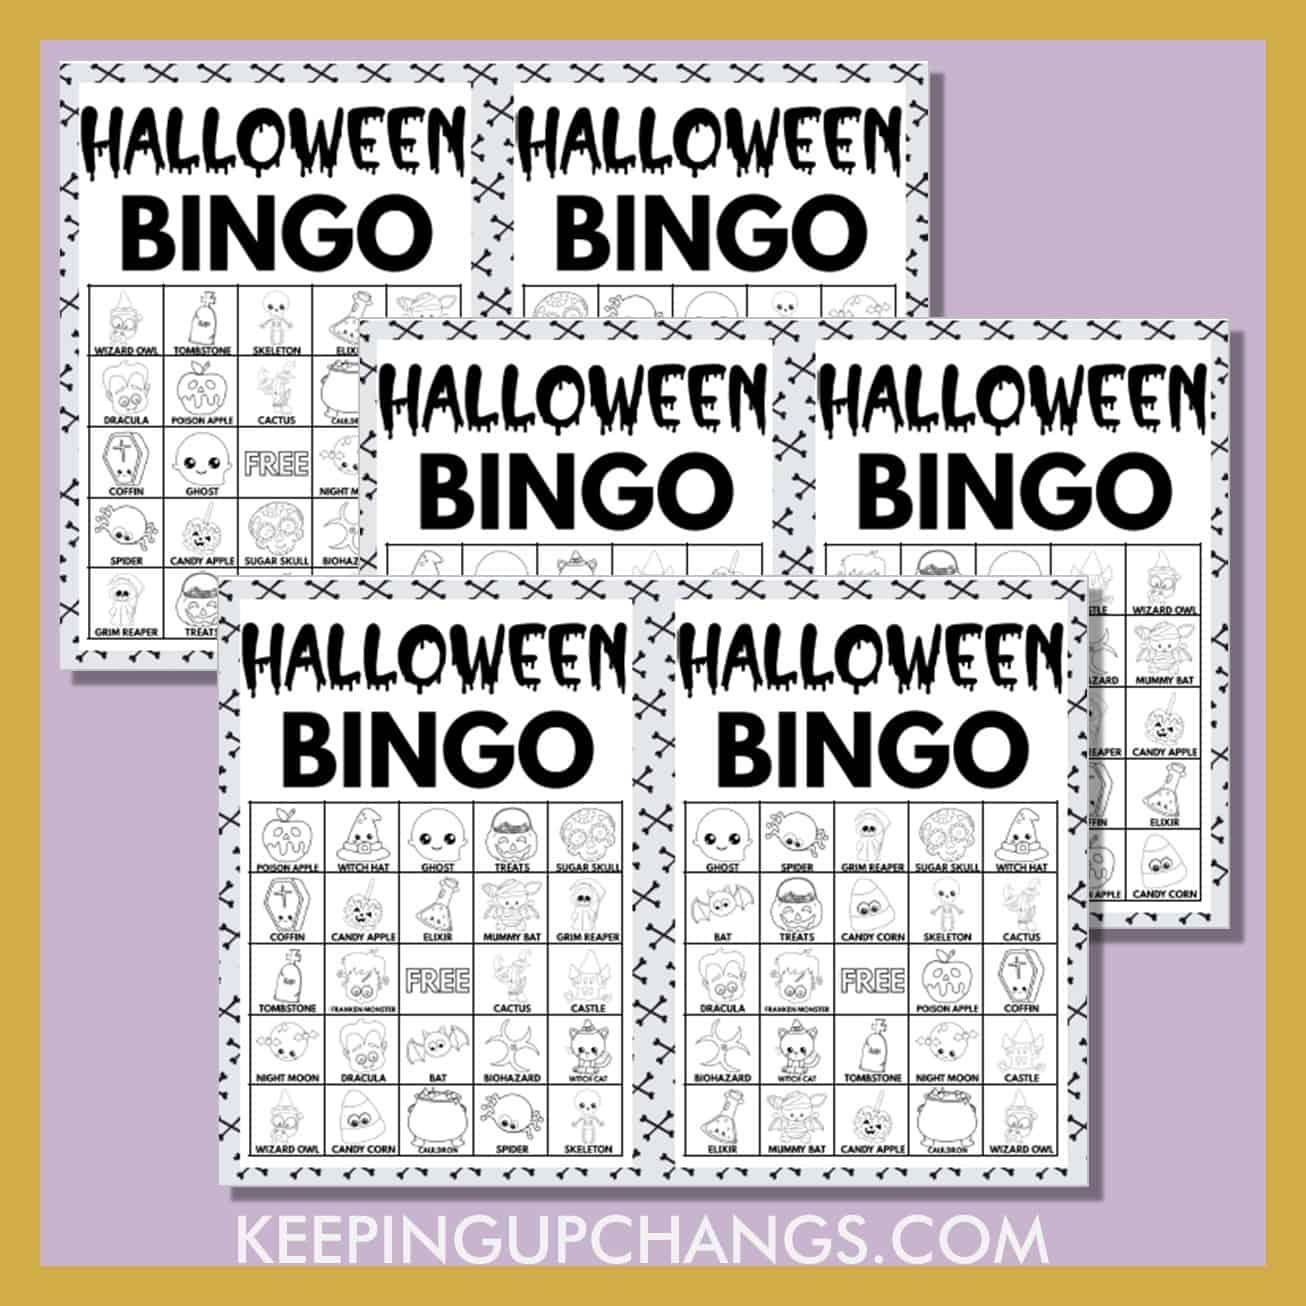 free fall halloween bingo 5x5 black white coloring game cards.